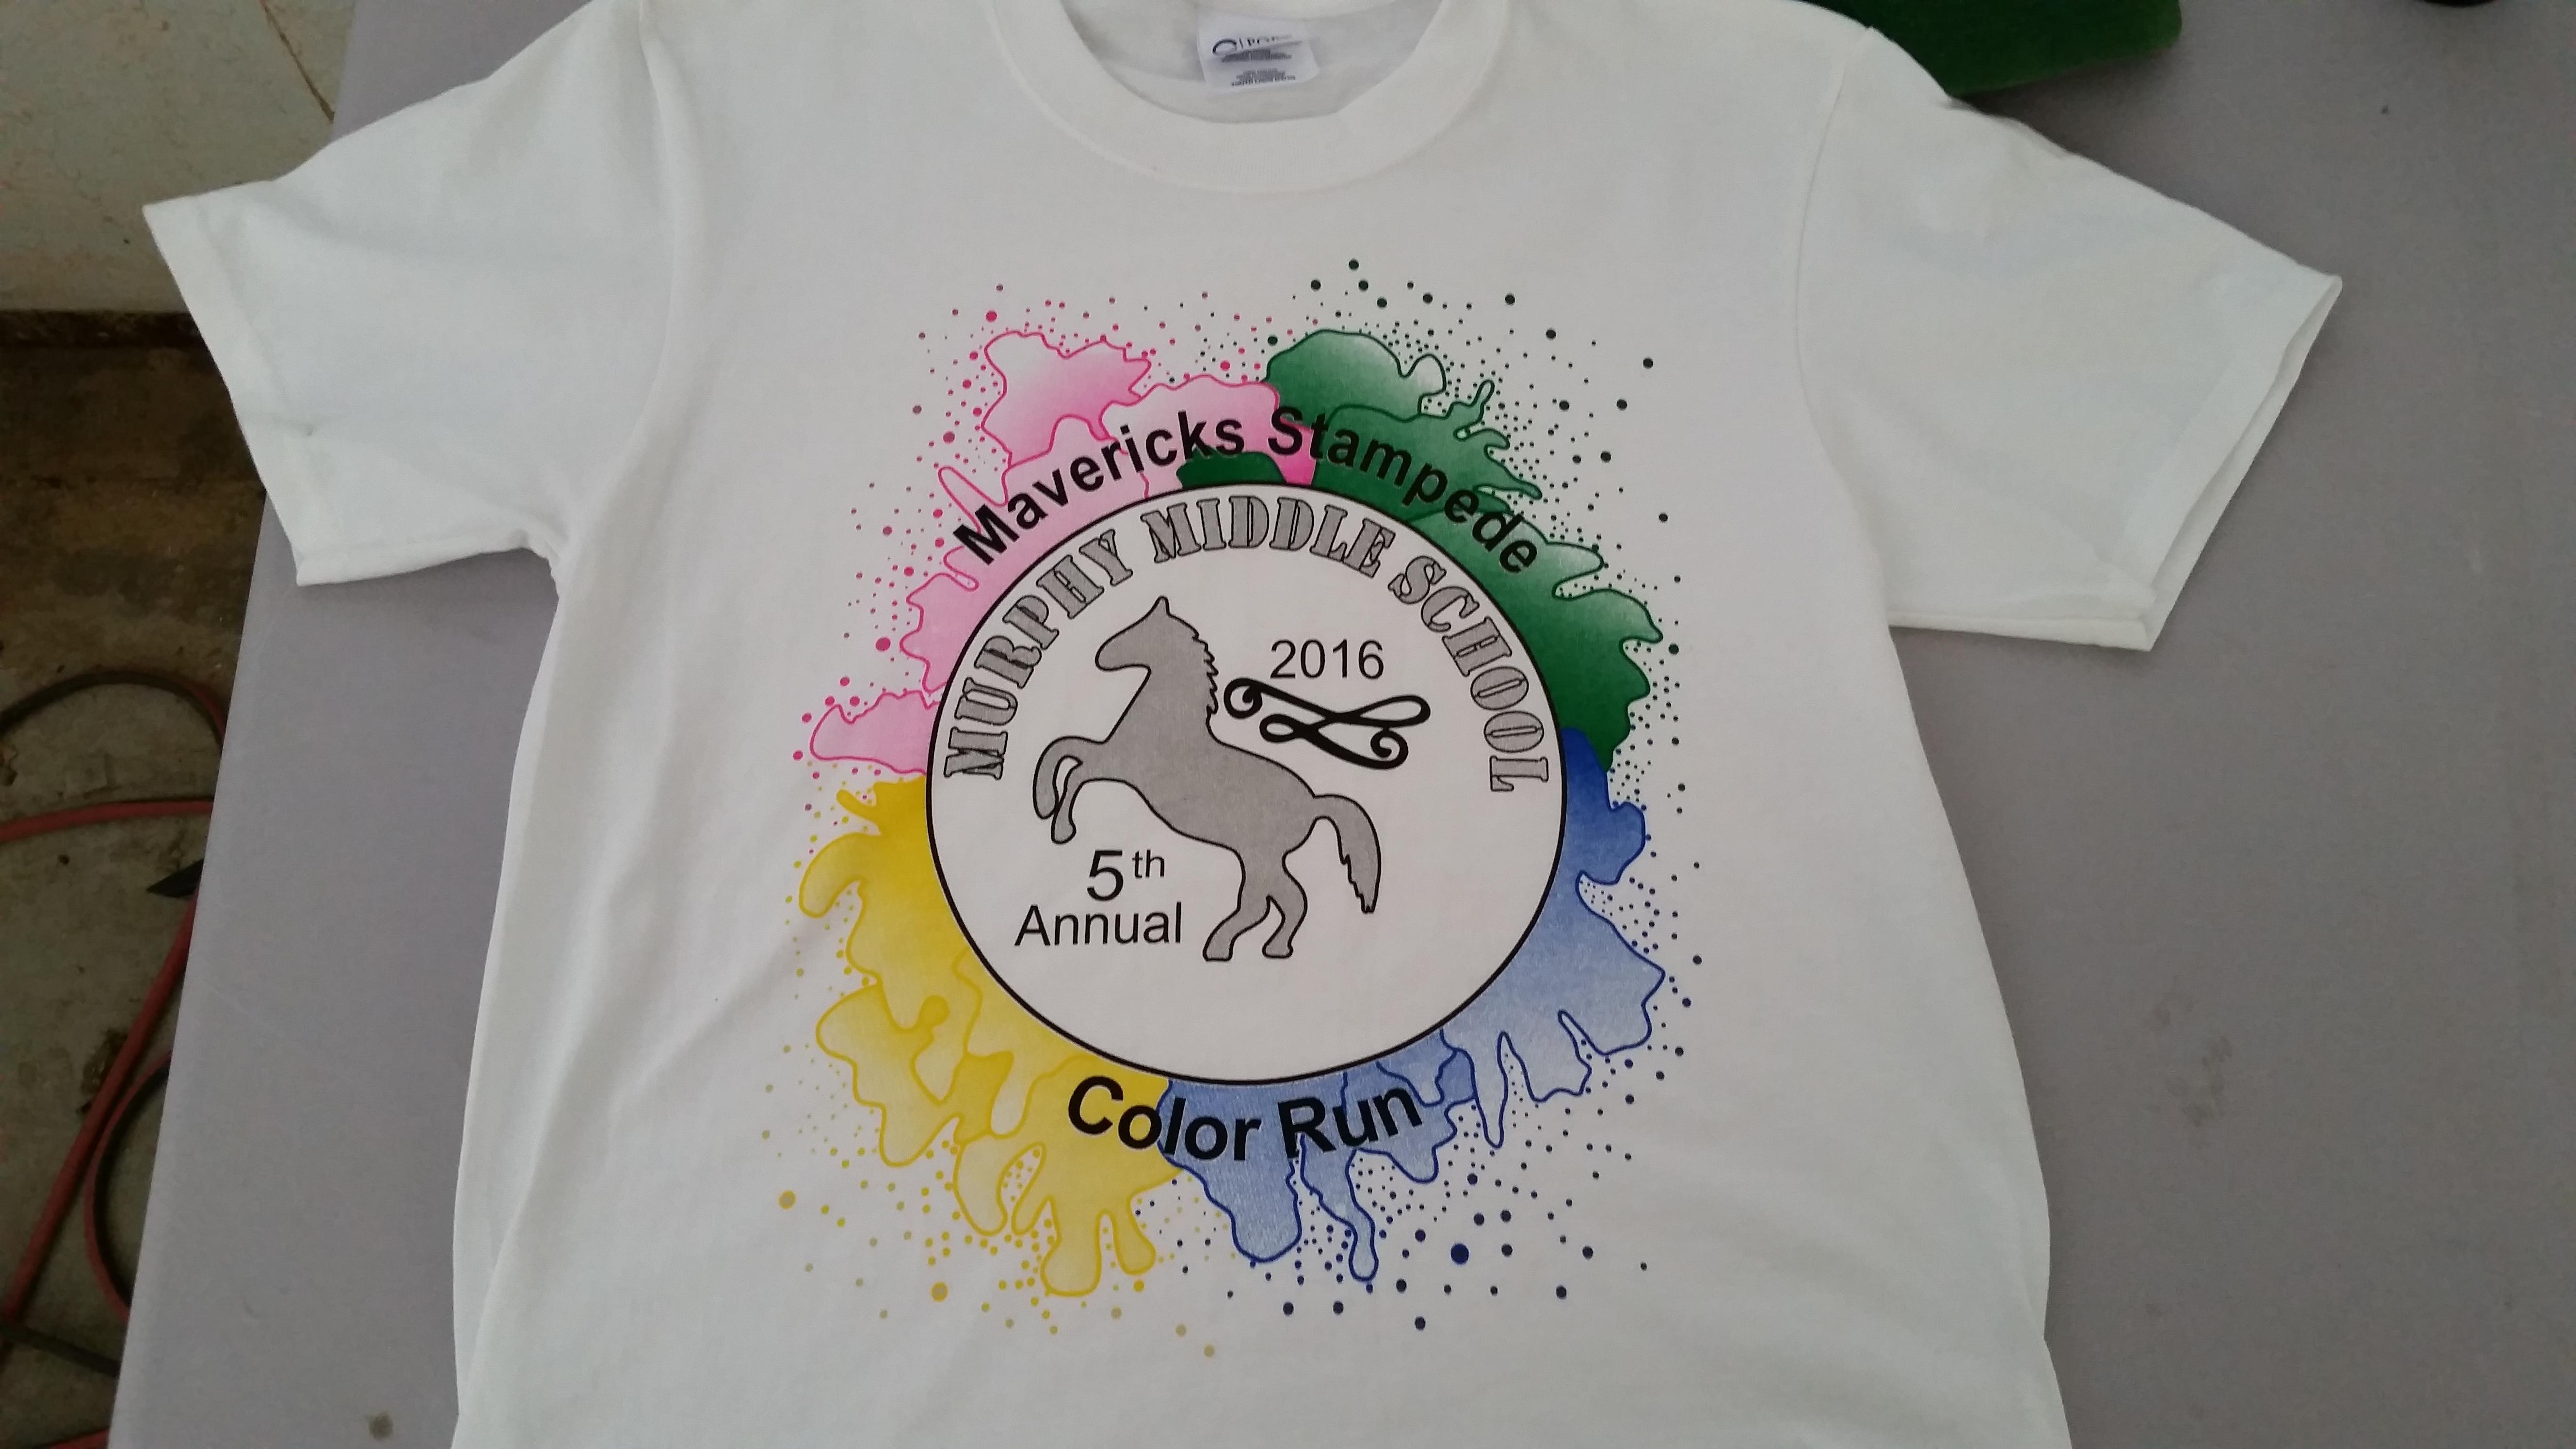 Charity 5K Shirts